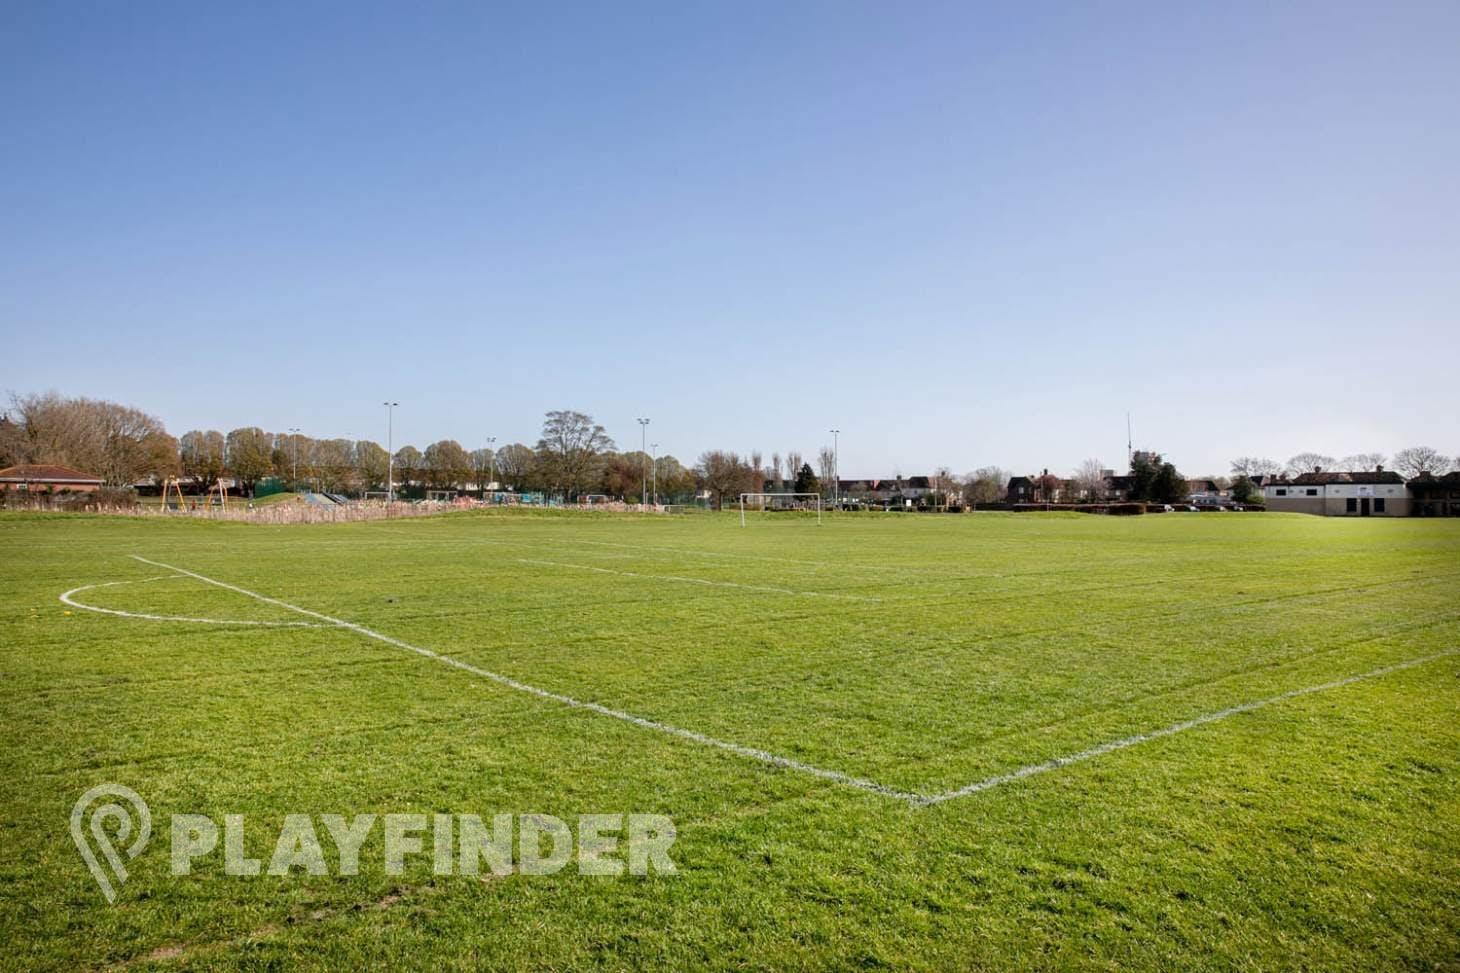 London Tigers Sports Complex 9 a side | Grass football pitch